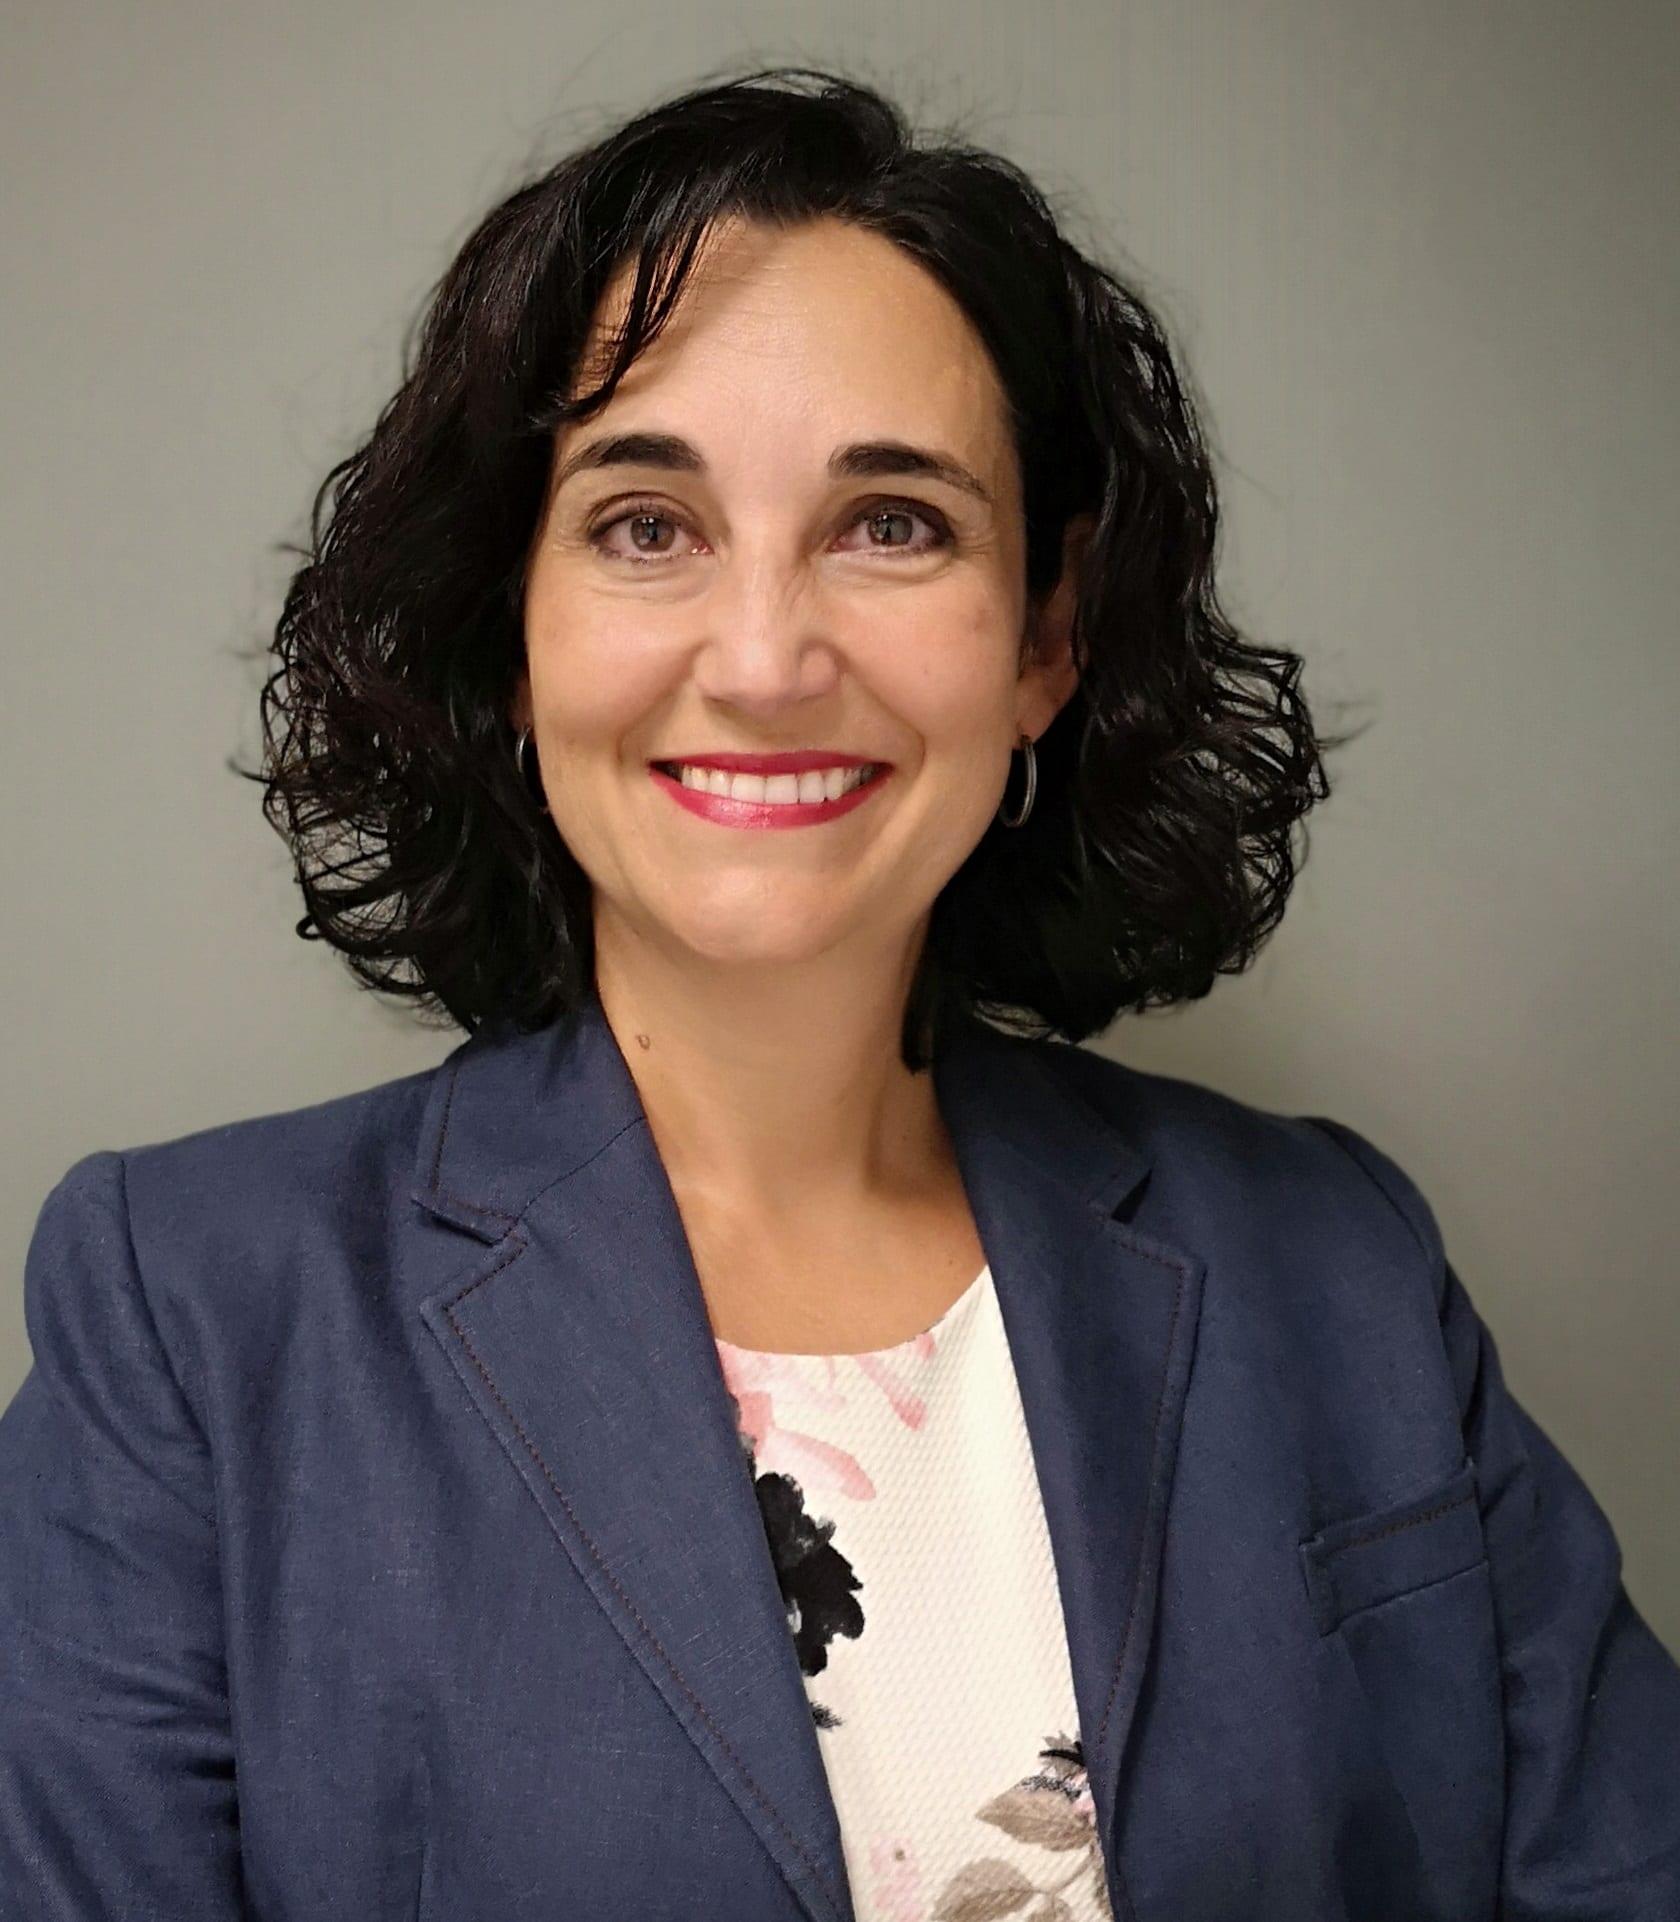 Susana Sierra smiles broadly straight into the camera